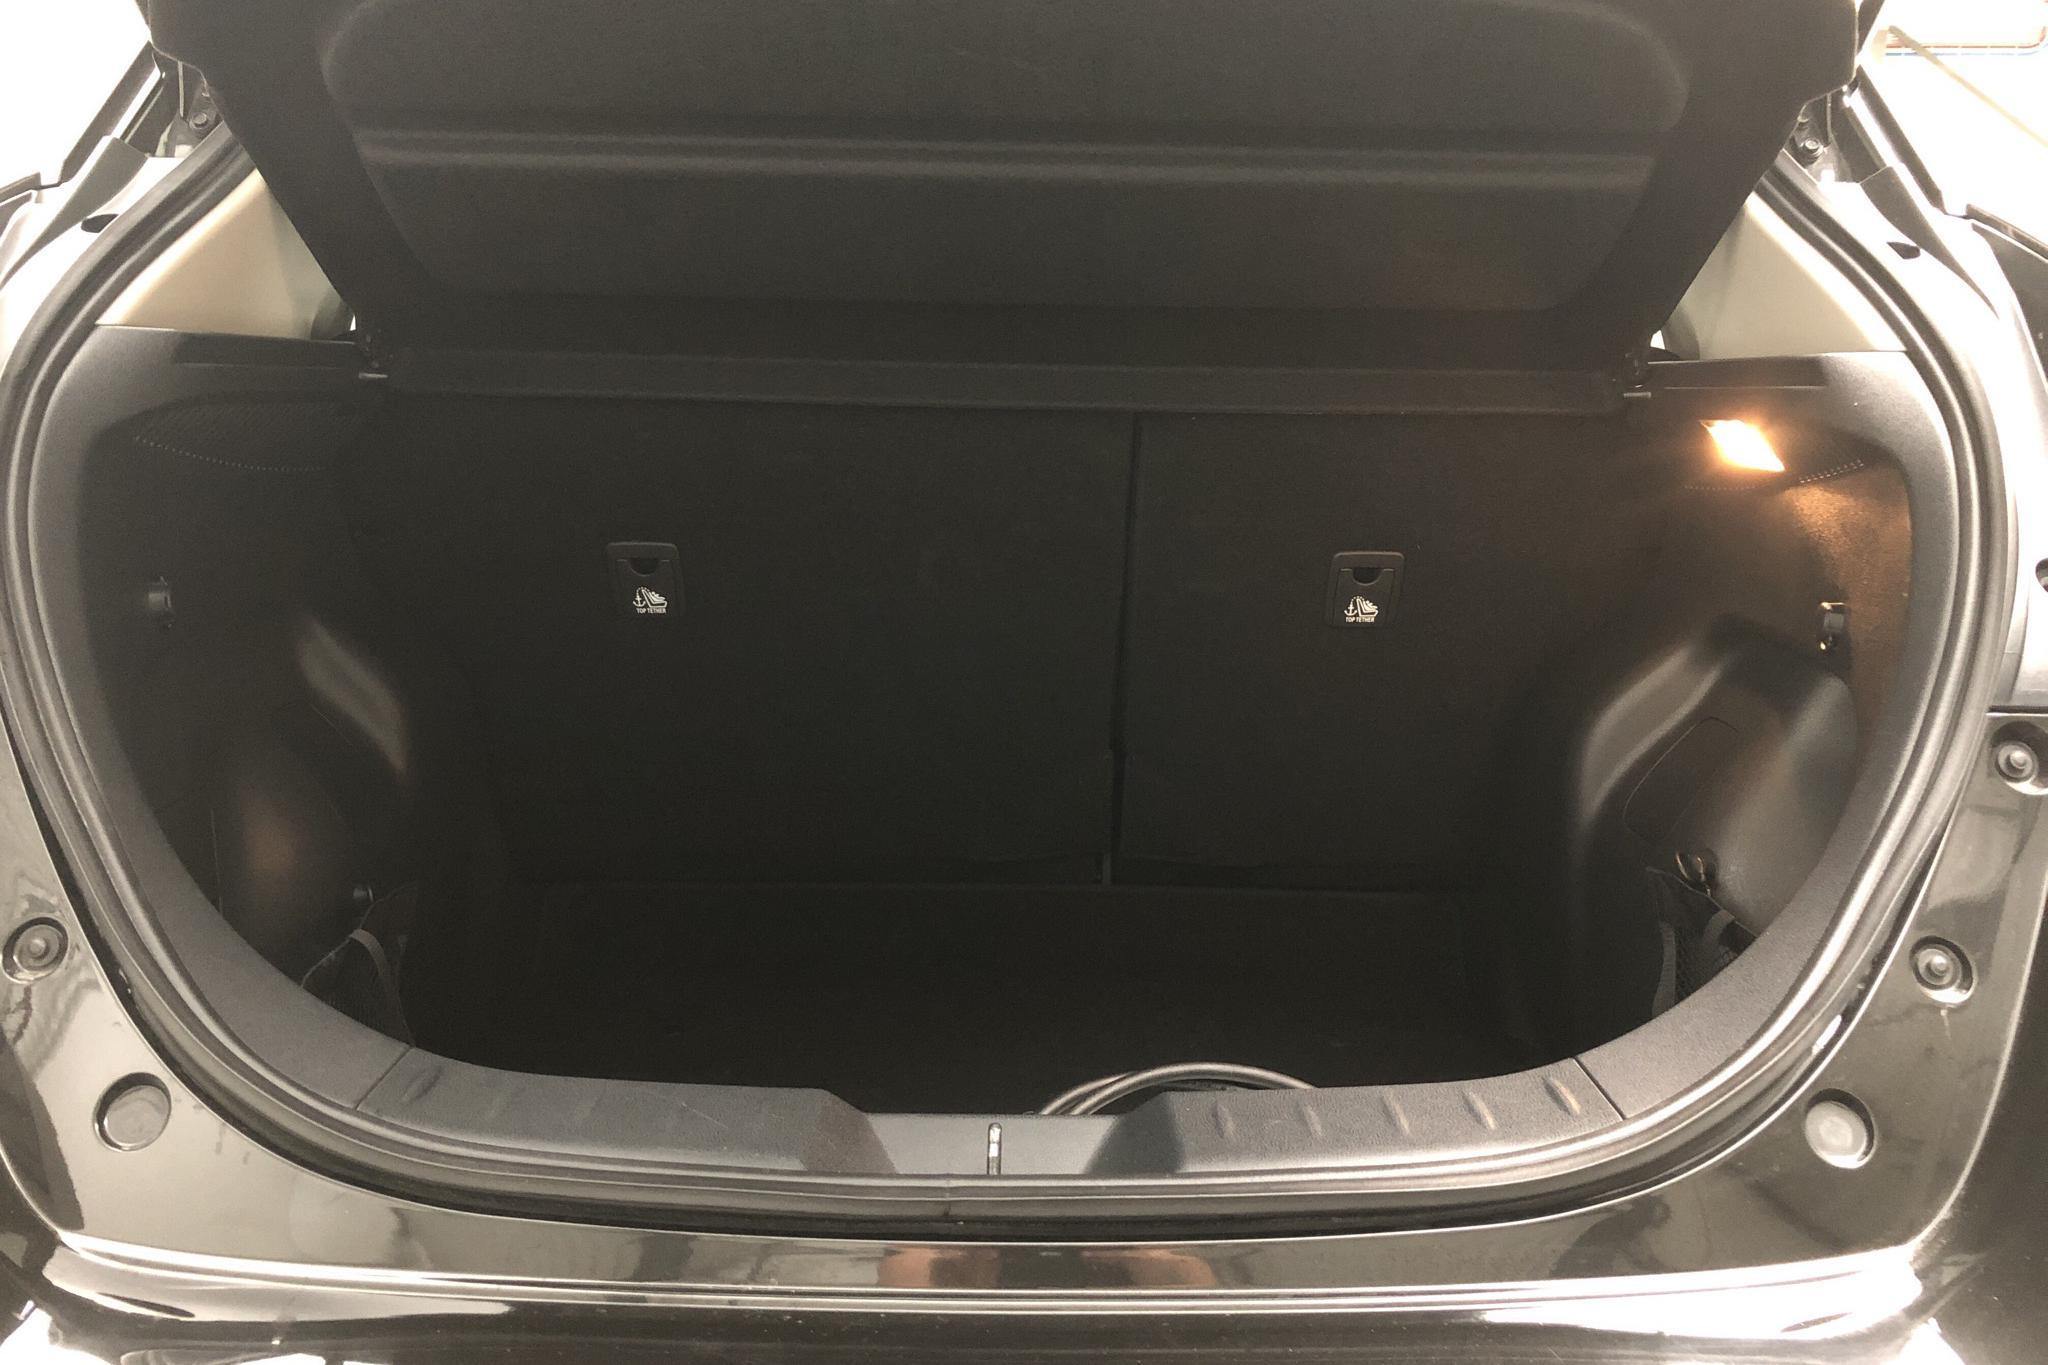 Nissan LEAF 5dr 40 kWh (150hk) - 3 340 mil - Automat - svart - 2018